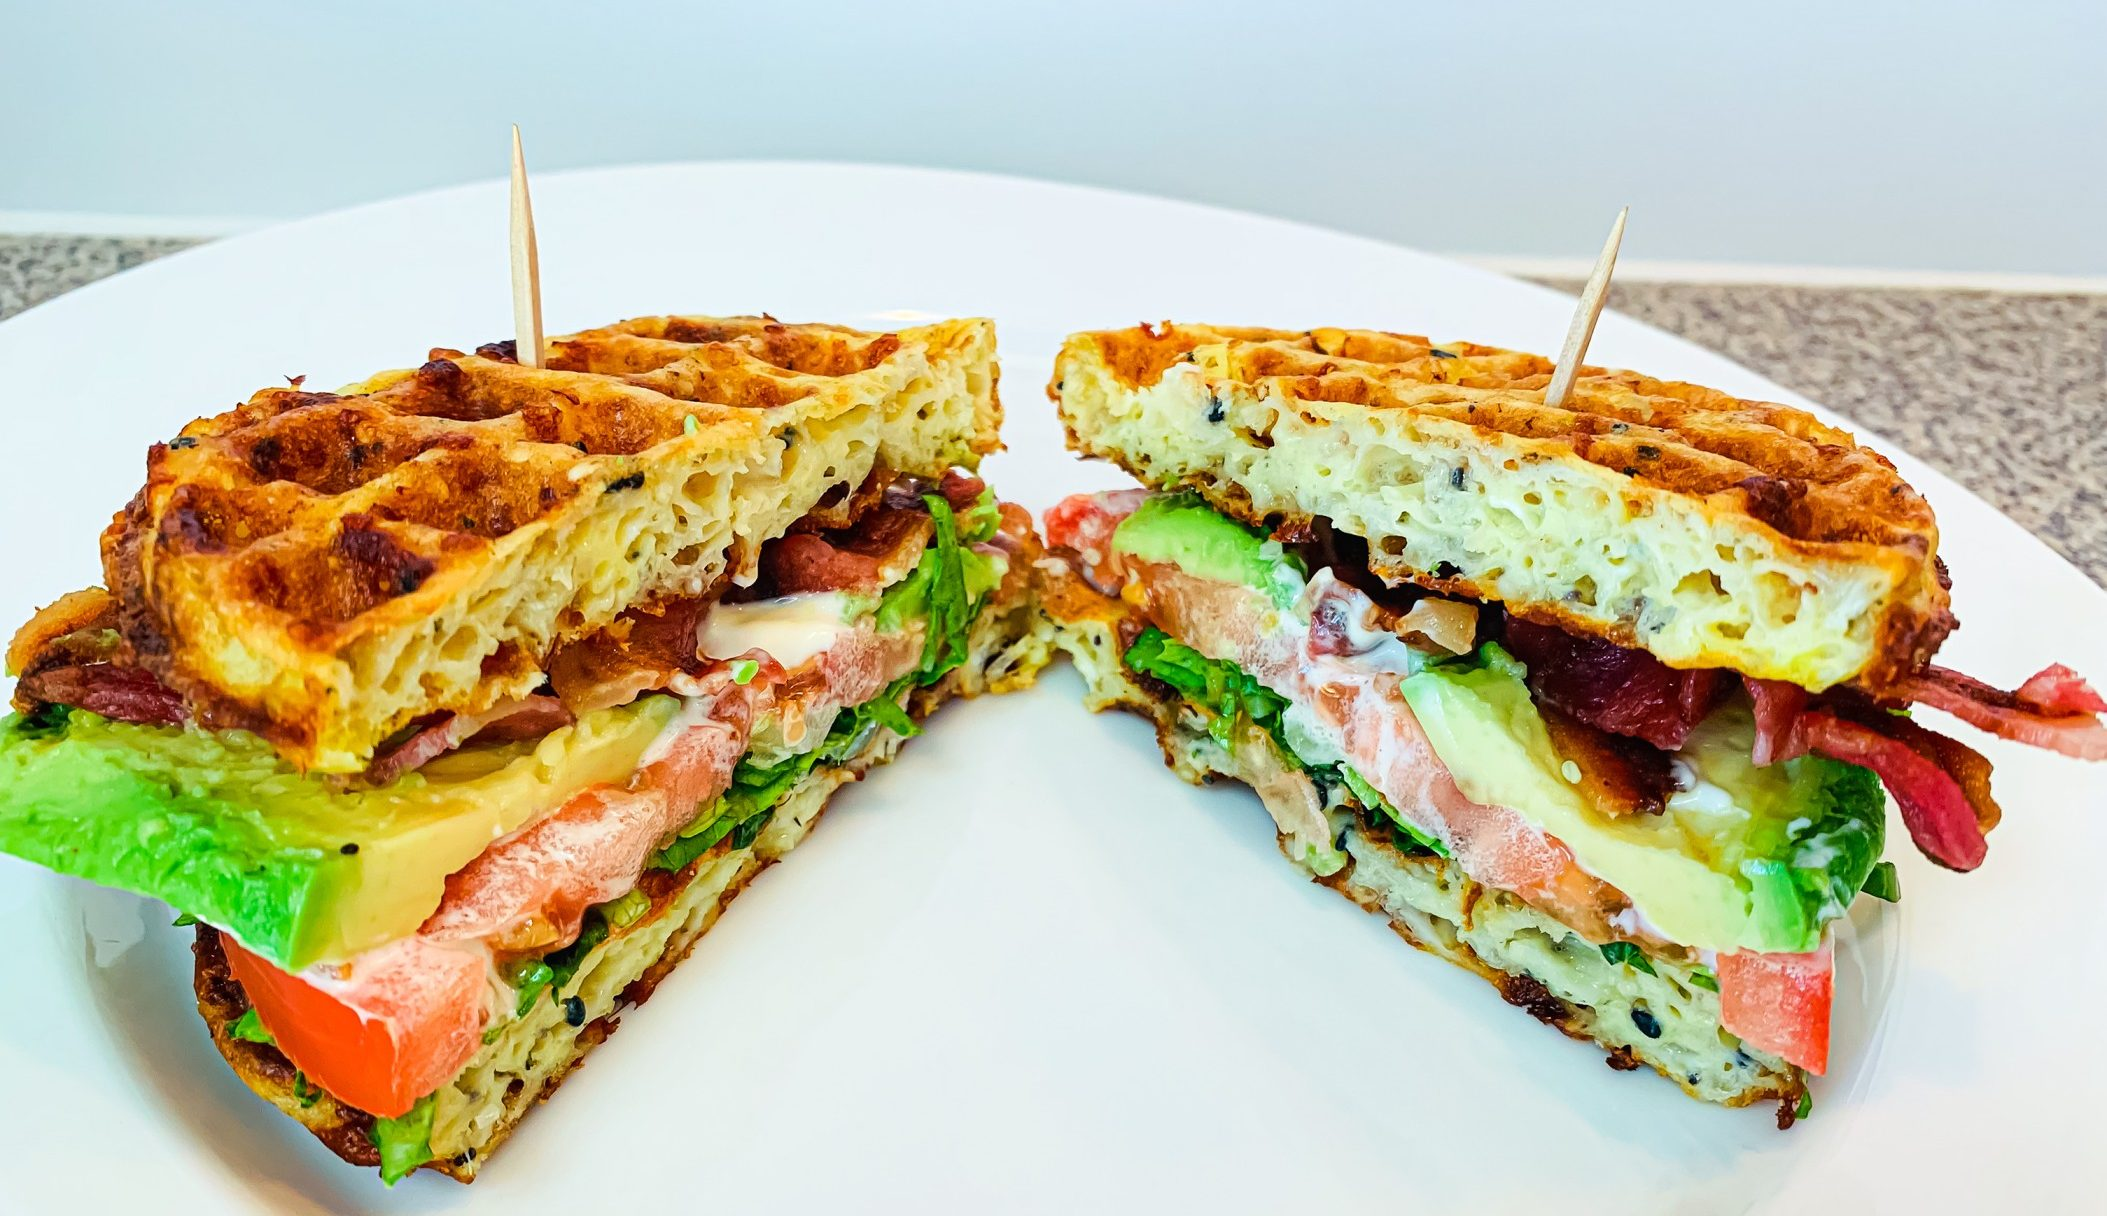 Keto BLT Avocado Chaffle Sandwich